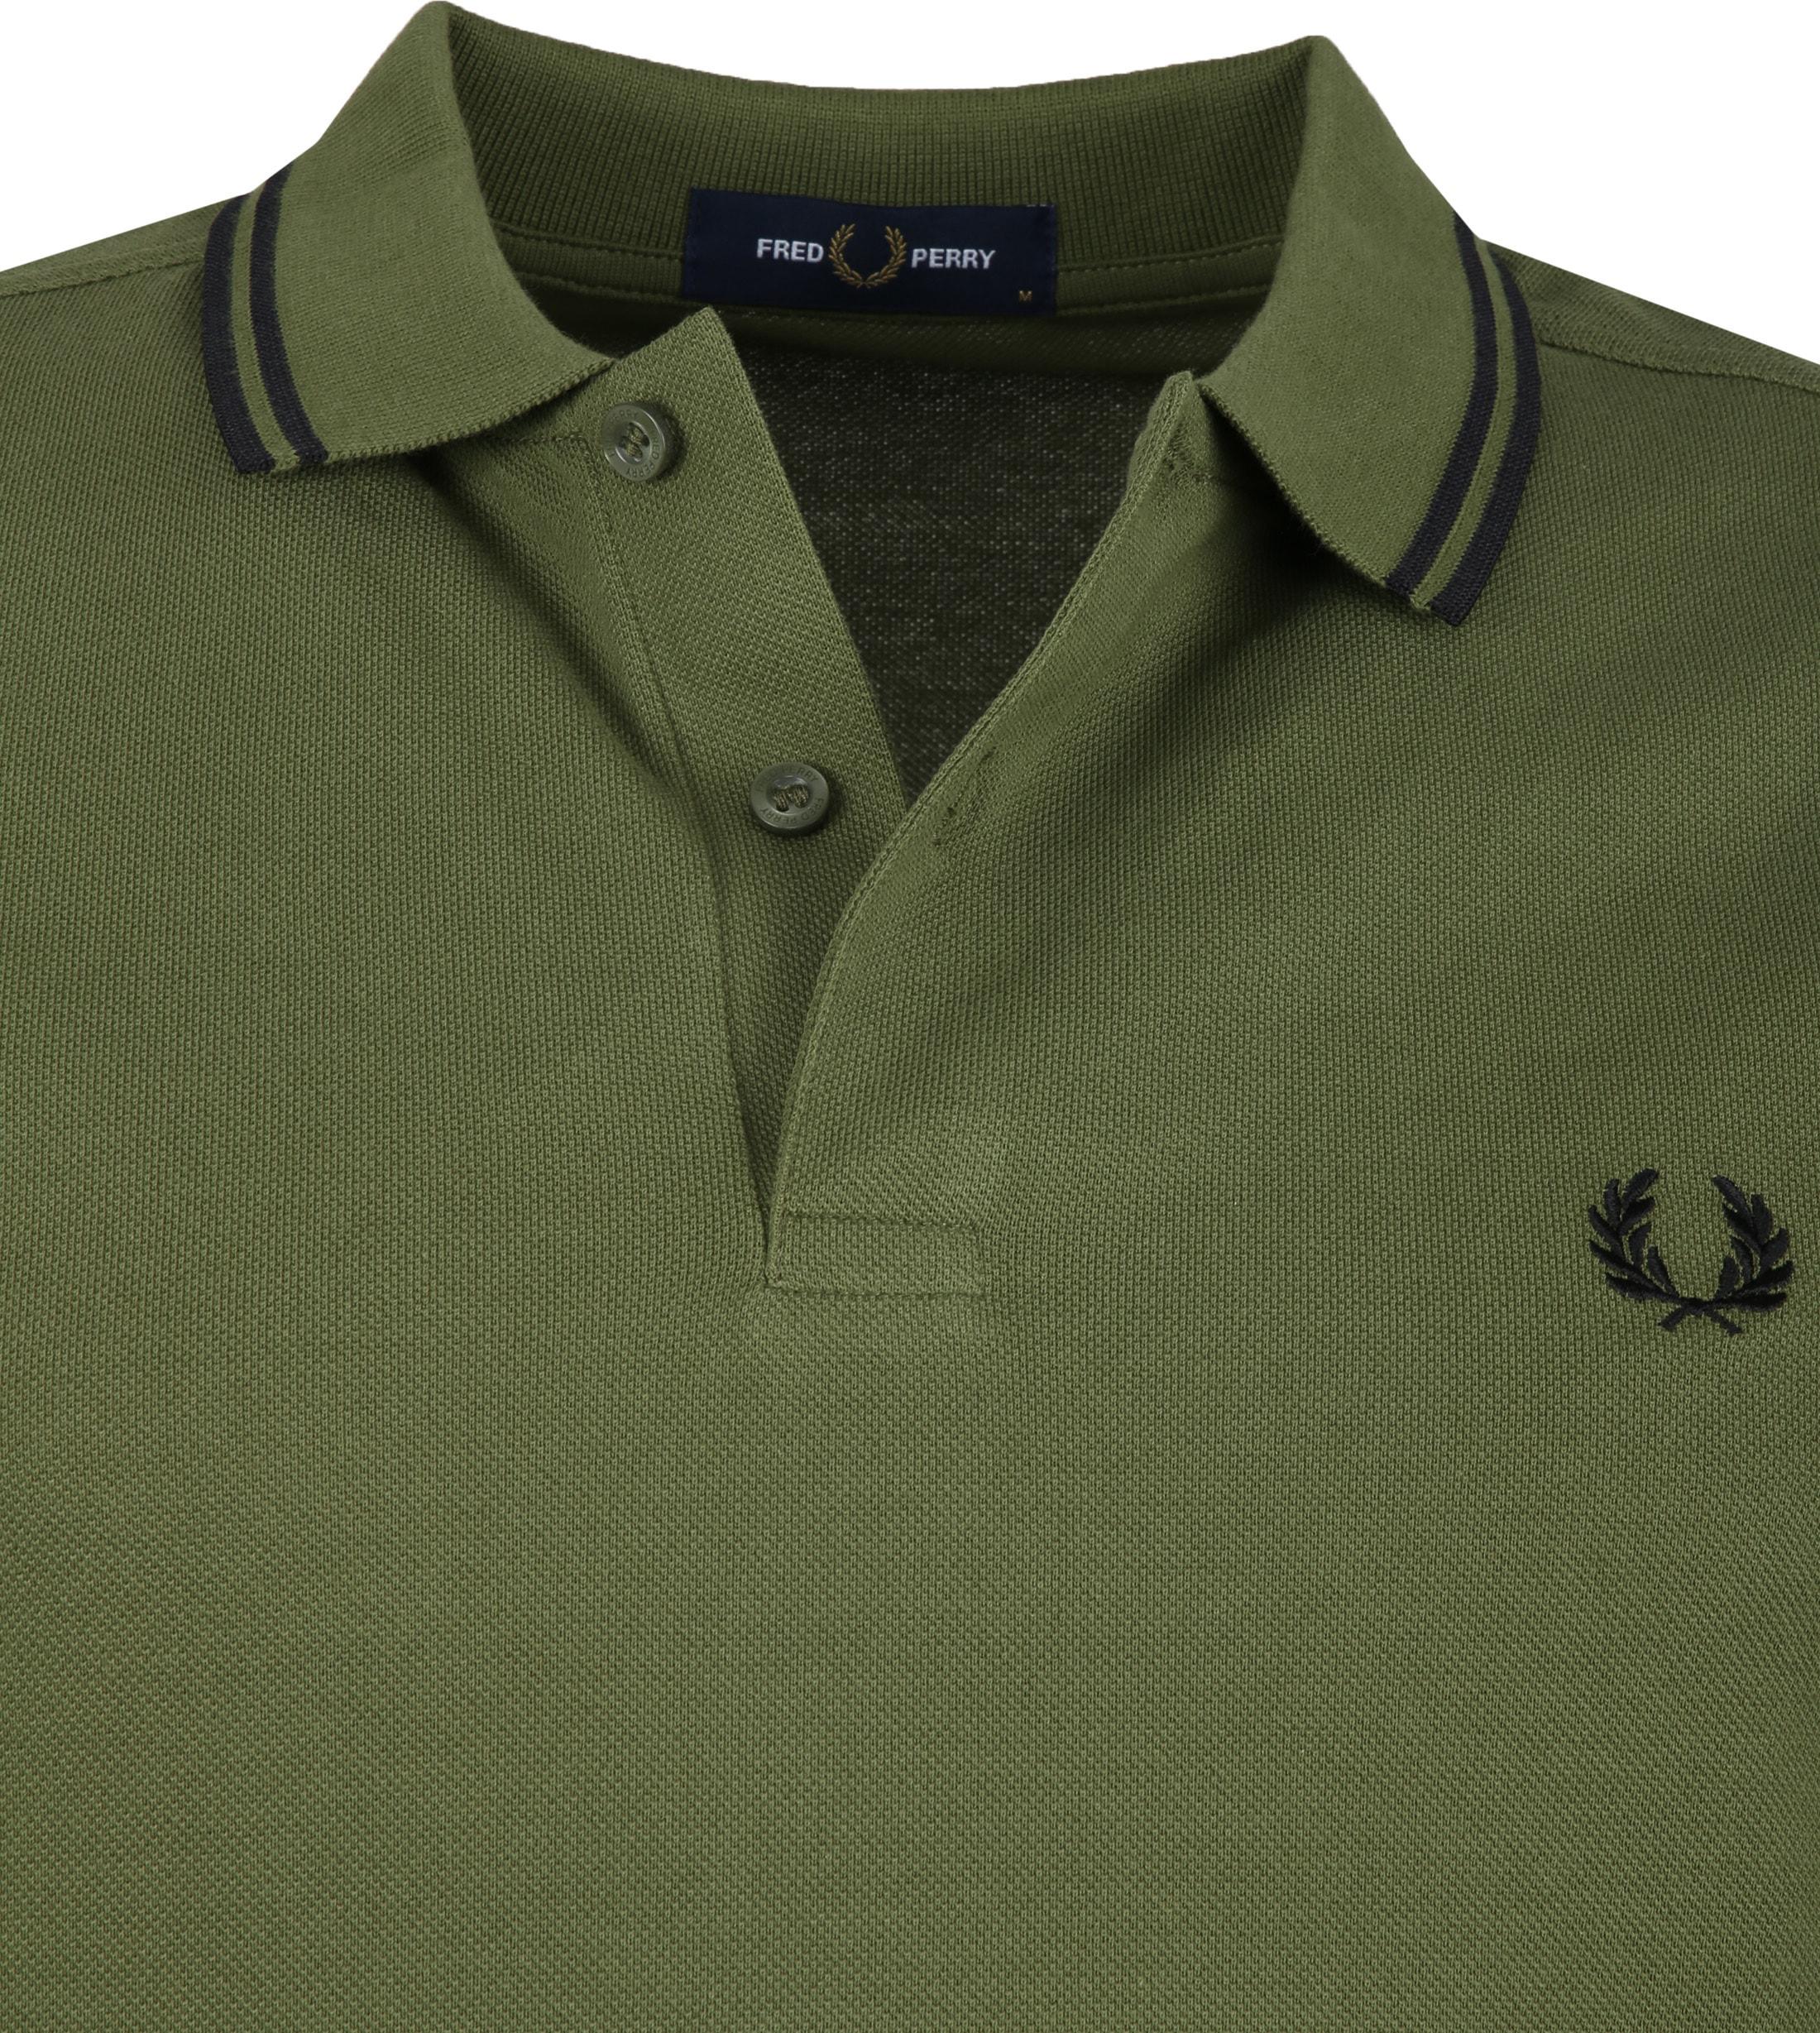 Fred Perry LS Poloshirt Dark Green foto 1